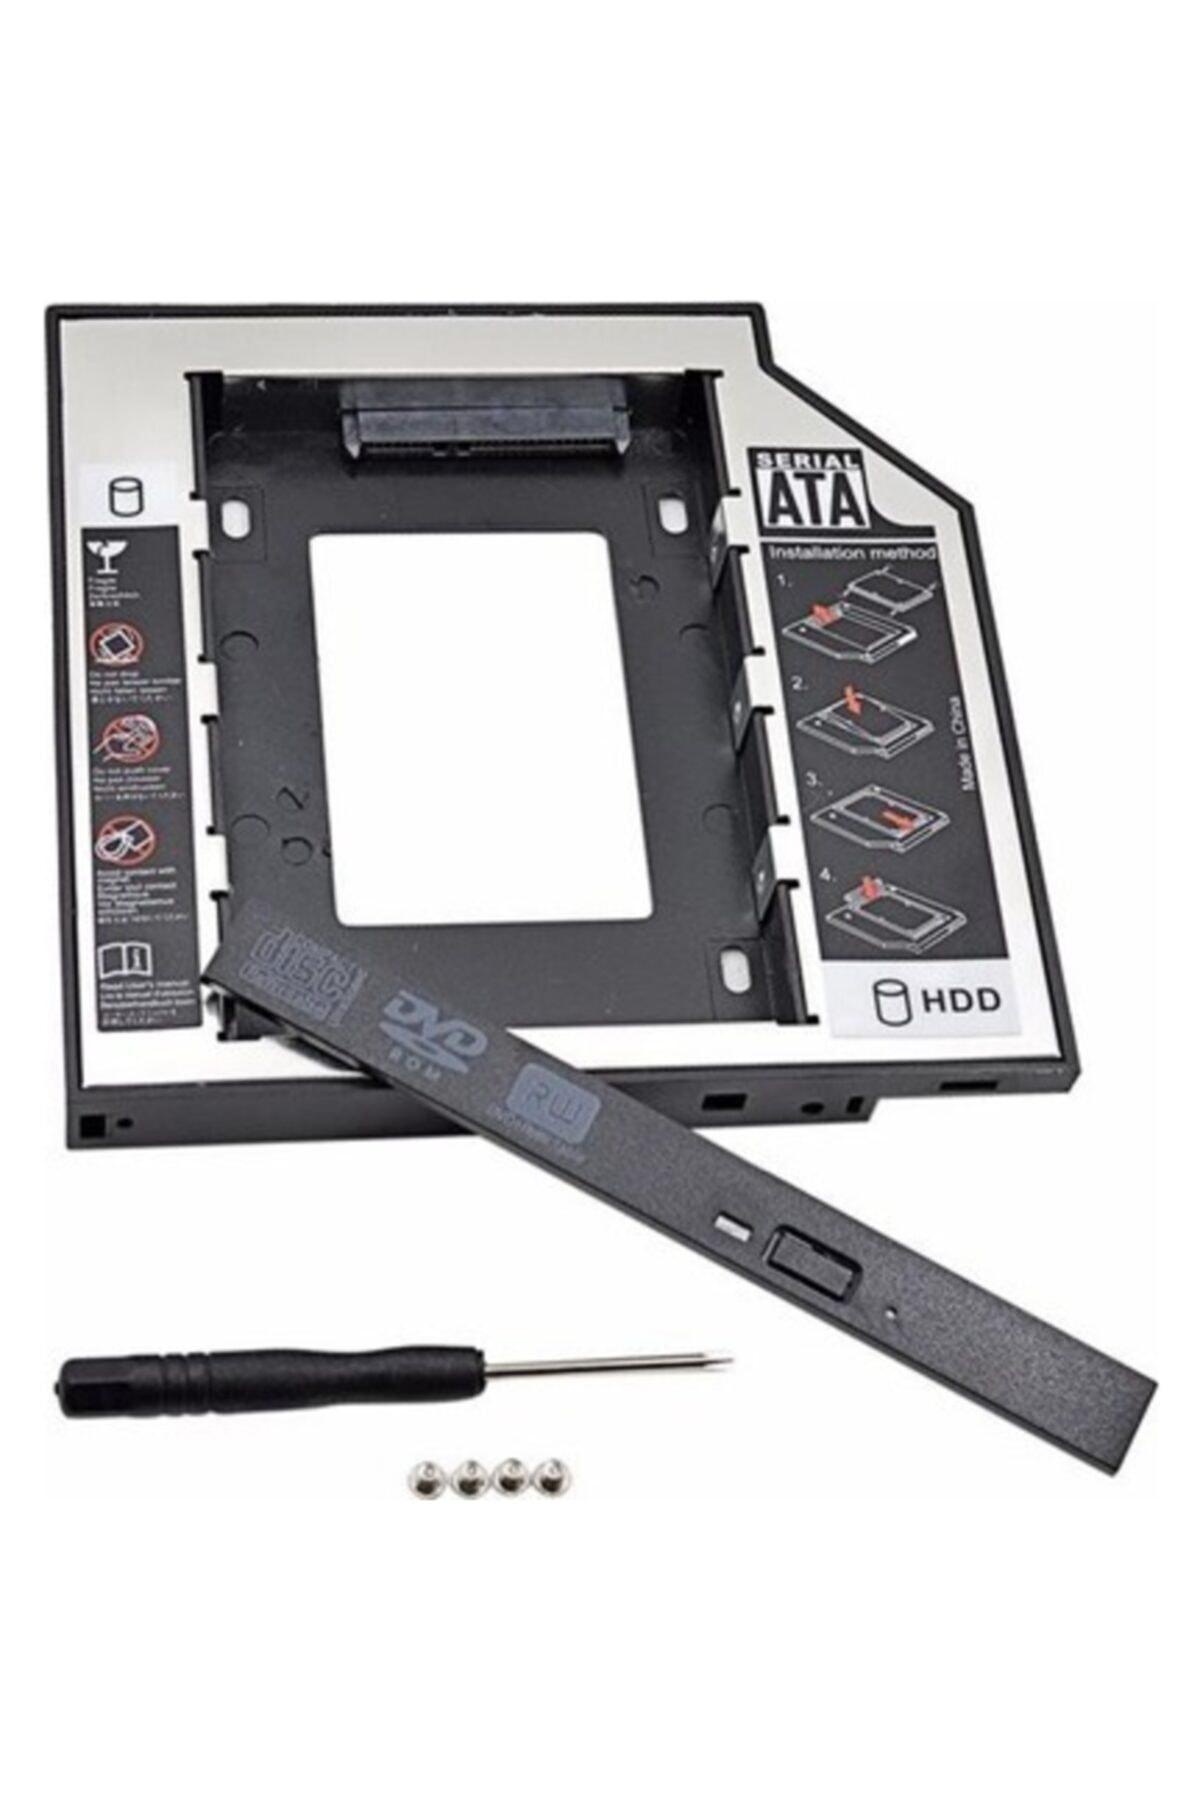 Notespare 9.5mm Hdd Caddy Kızak Notebook Laptop Dvd To Ssd Kutu Sata 4717p 1